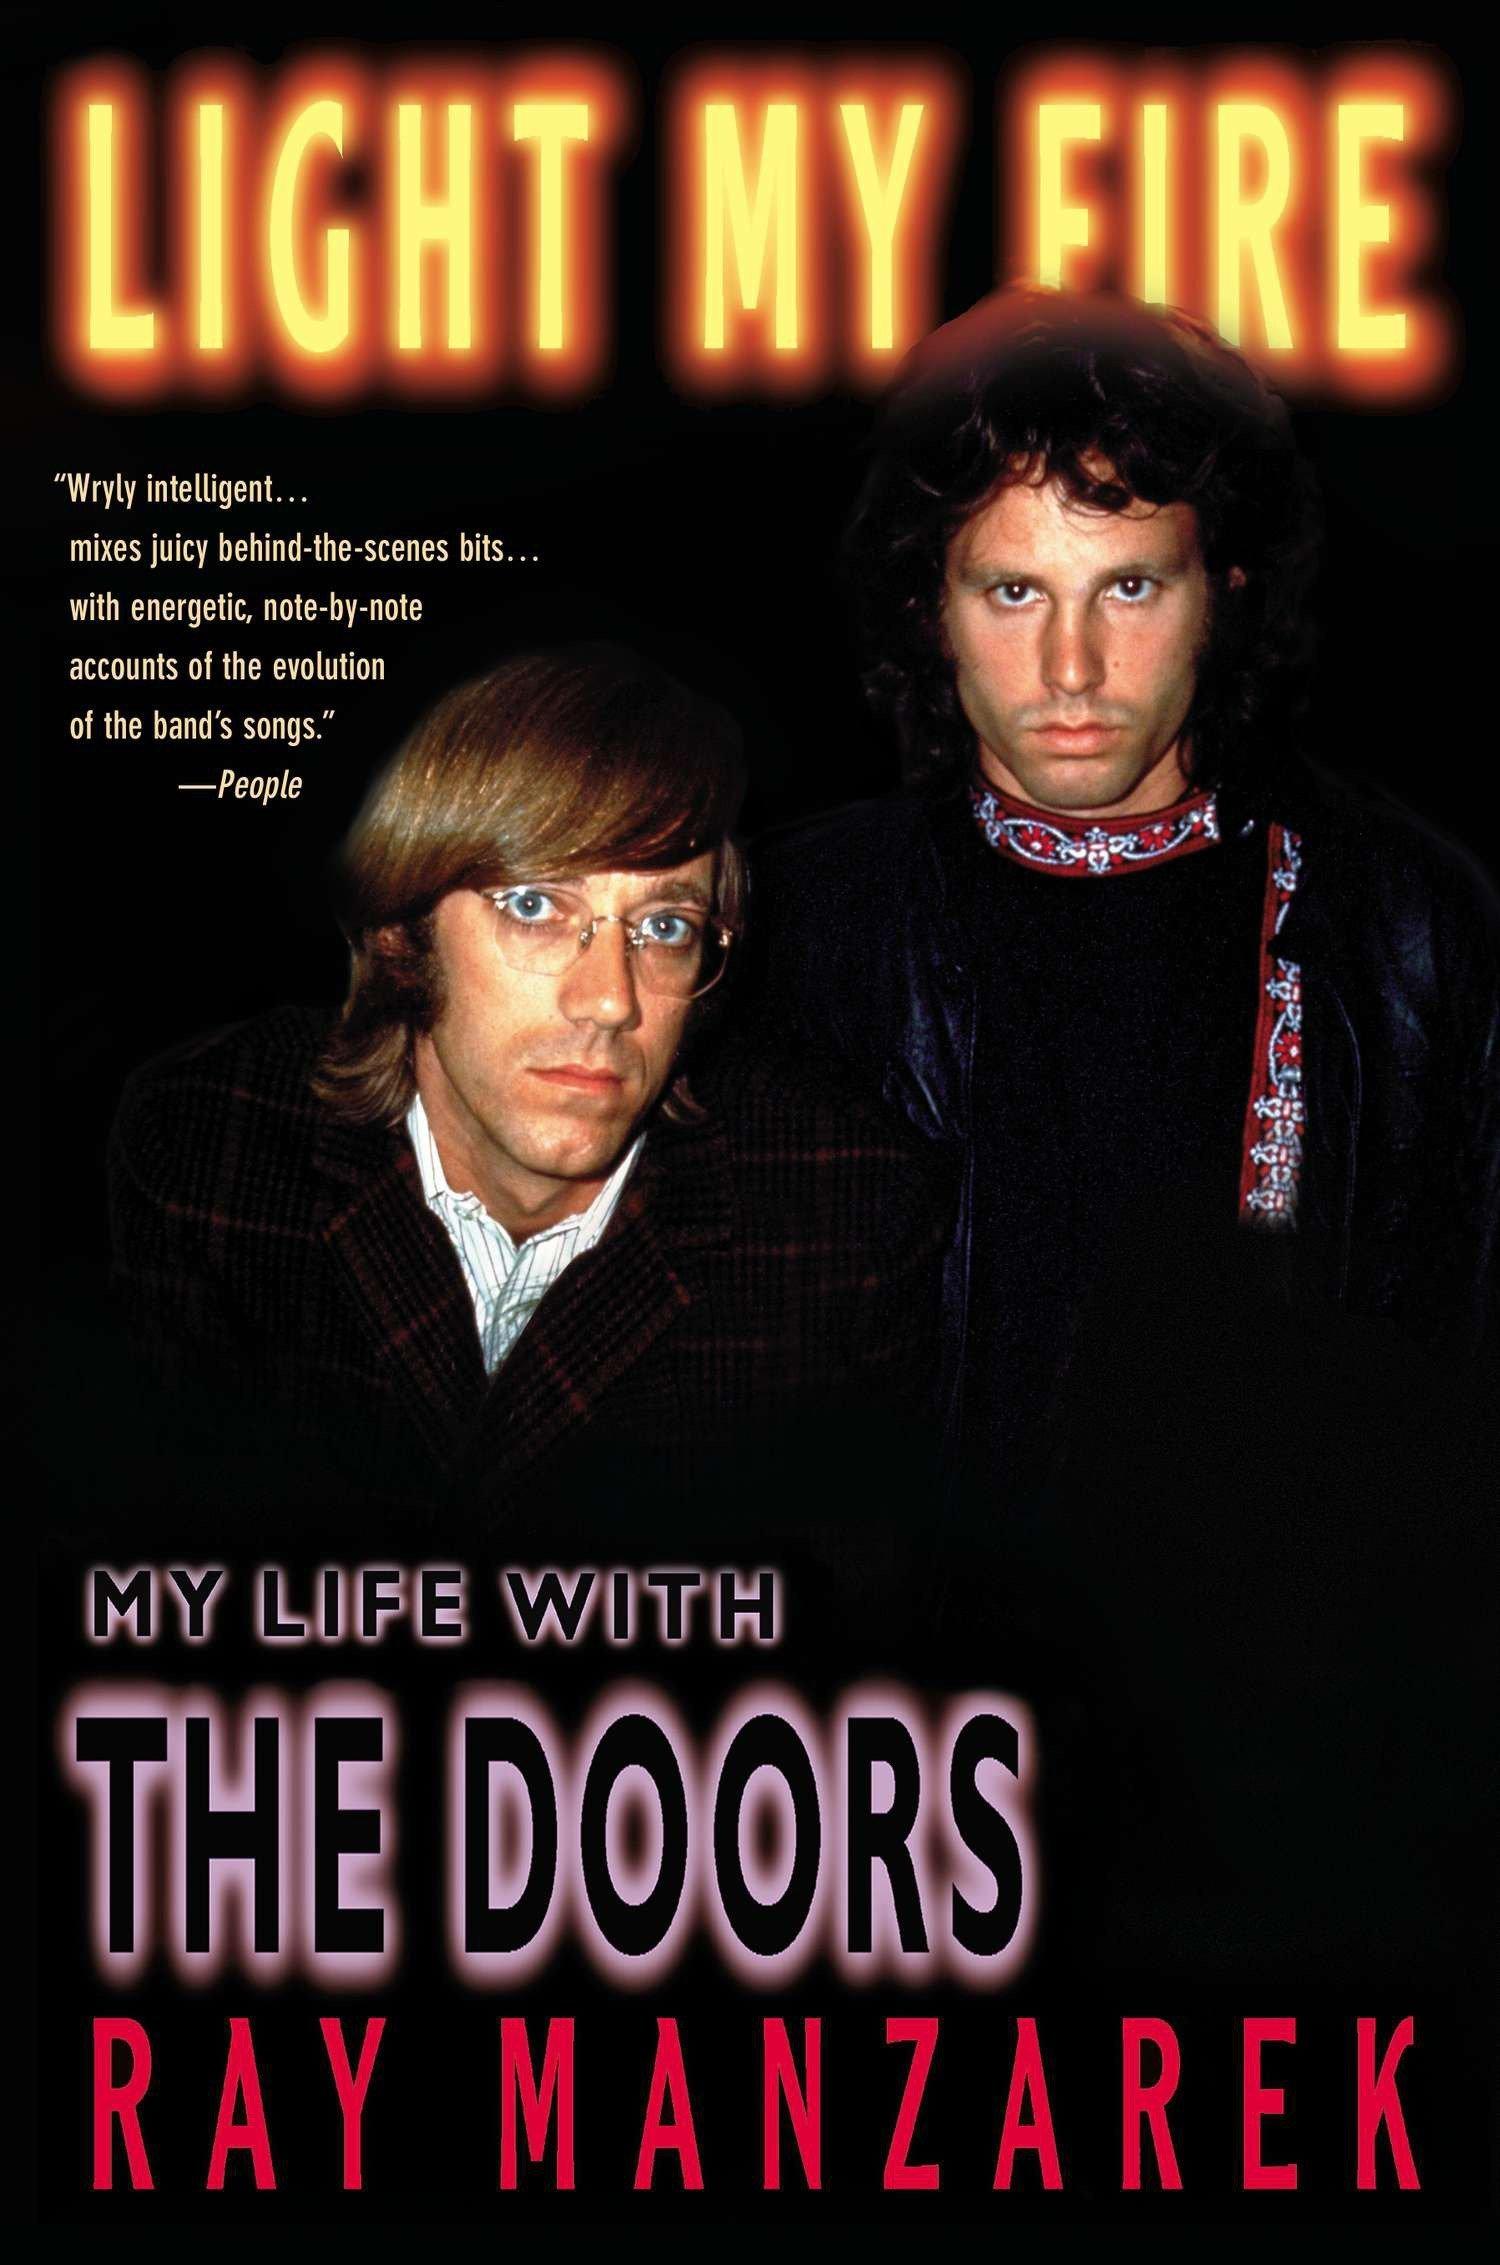 Light My Fire My Life With The Doors Ray Manzarek 9780425170458